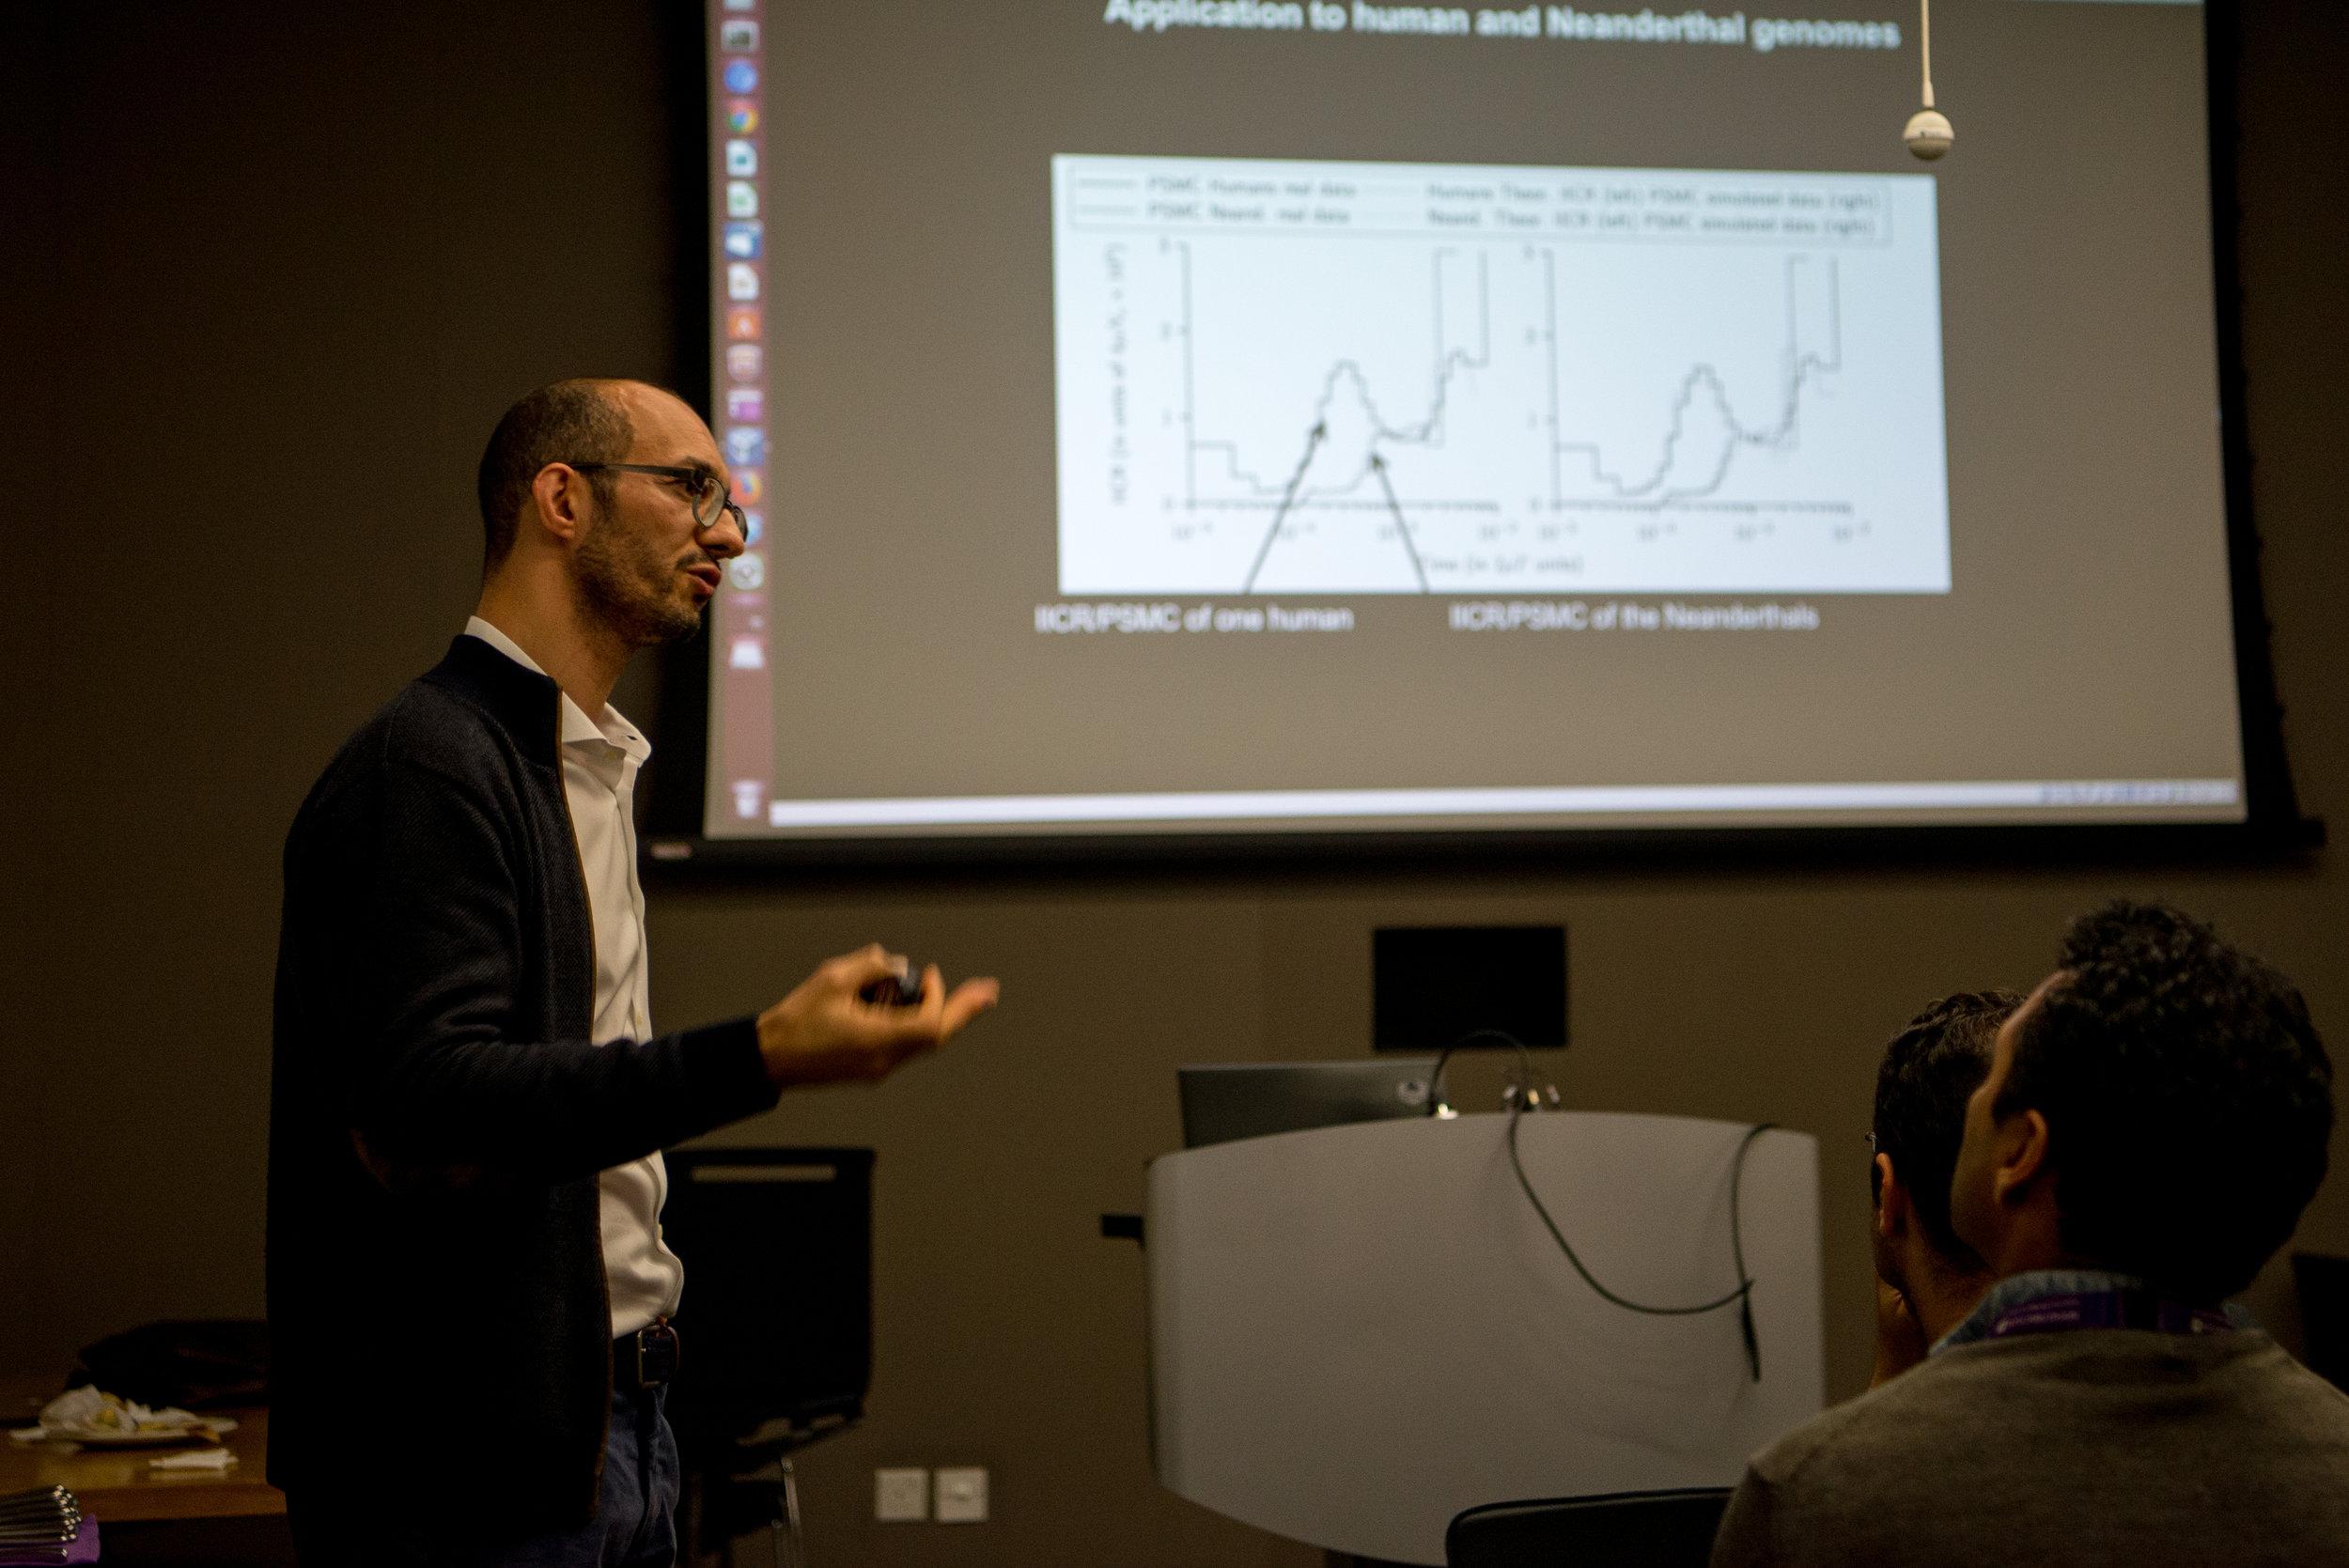 Dr. cHICKHI Gives a lecture during the Biology Seminar Series at NYU ABU DHABI